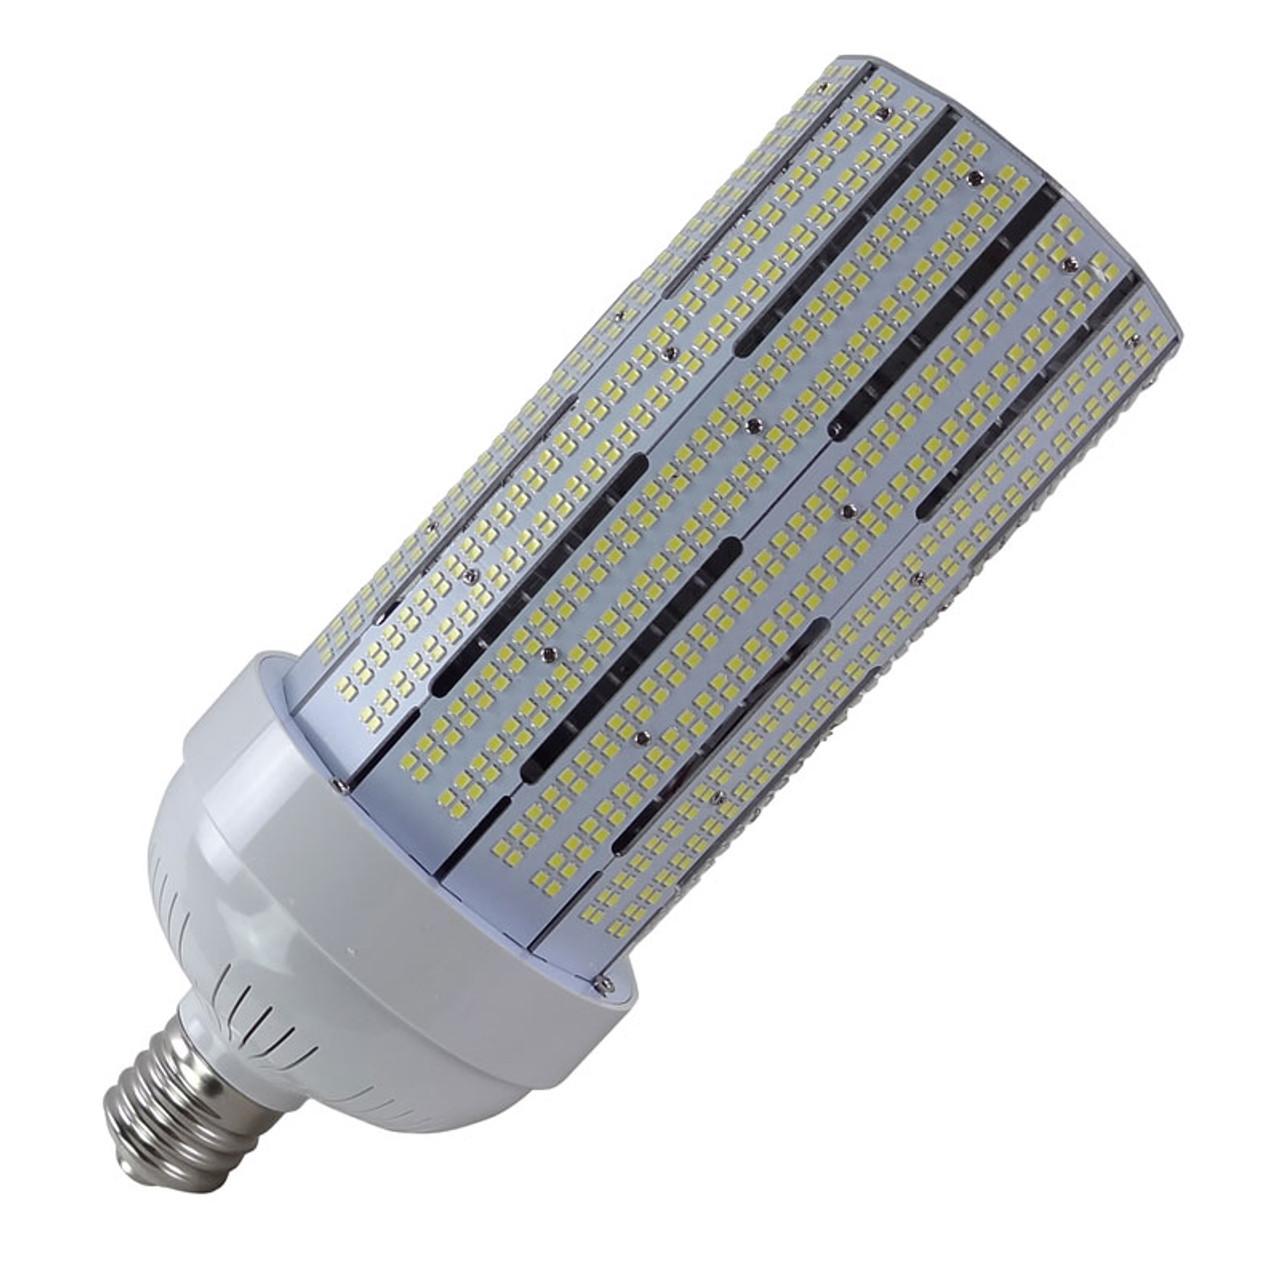 1000 Watt Metal Halide Led Replacement 300 watt led corn bulb, replaces 2,000 watt hid, 45,000 lumen, internal  driver, cri 80, 50,000 hours, 10 year warranty